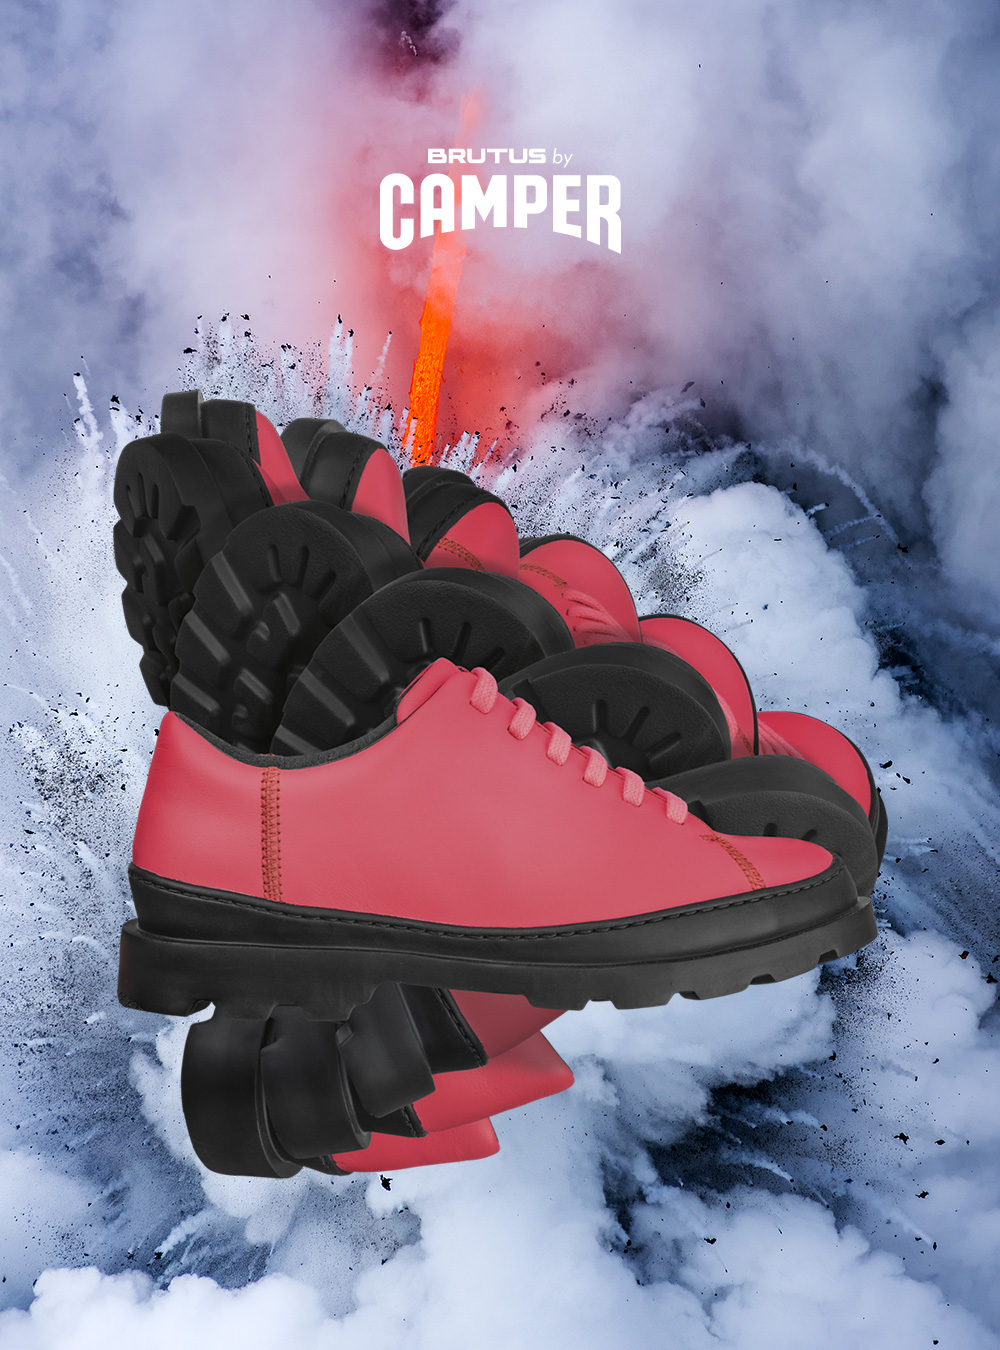 Camper_T87_Webkit_Product-Portrait-Brutus_W